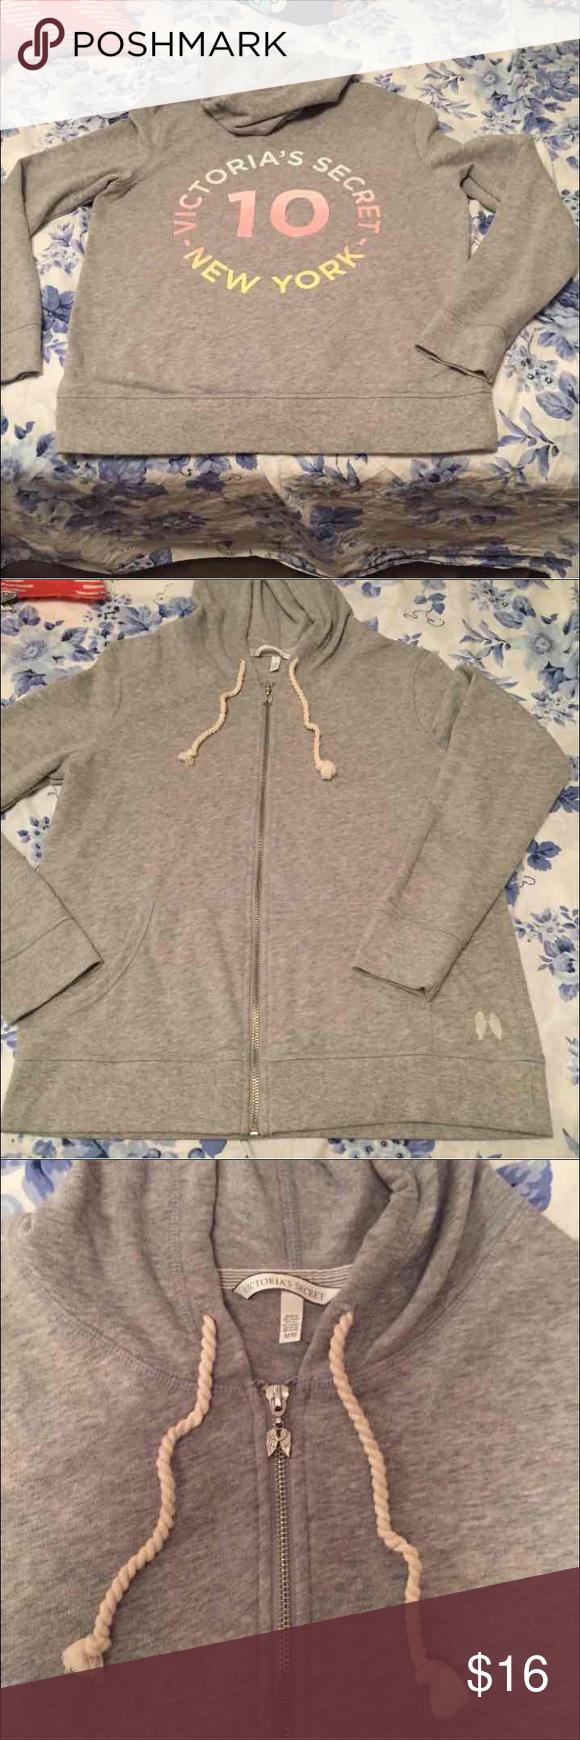 Victoria's Secret 10 hoodie! Size medium!  No flaws has cute wings zipper!  The hoodie has wings near the pocket on front of hoodie! Victoria's Secret Jackets & Coats